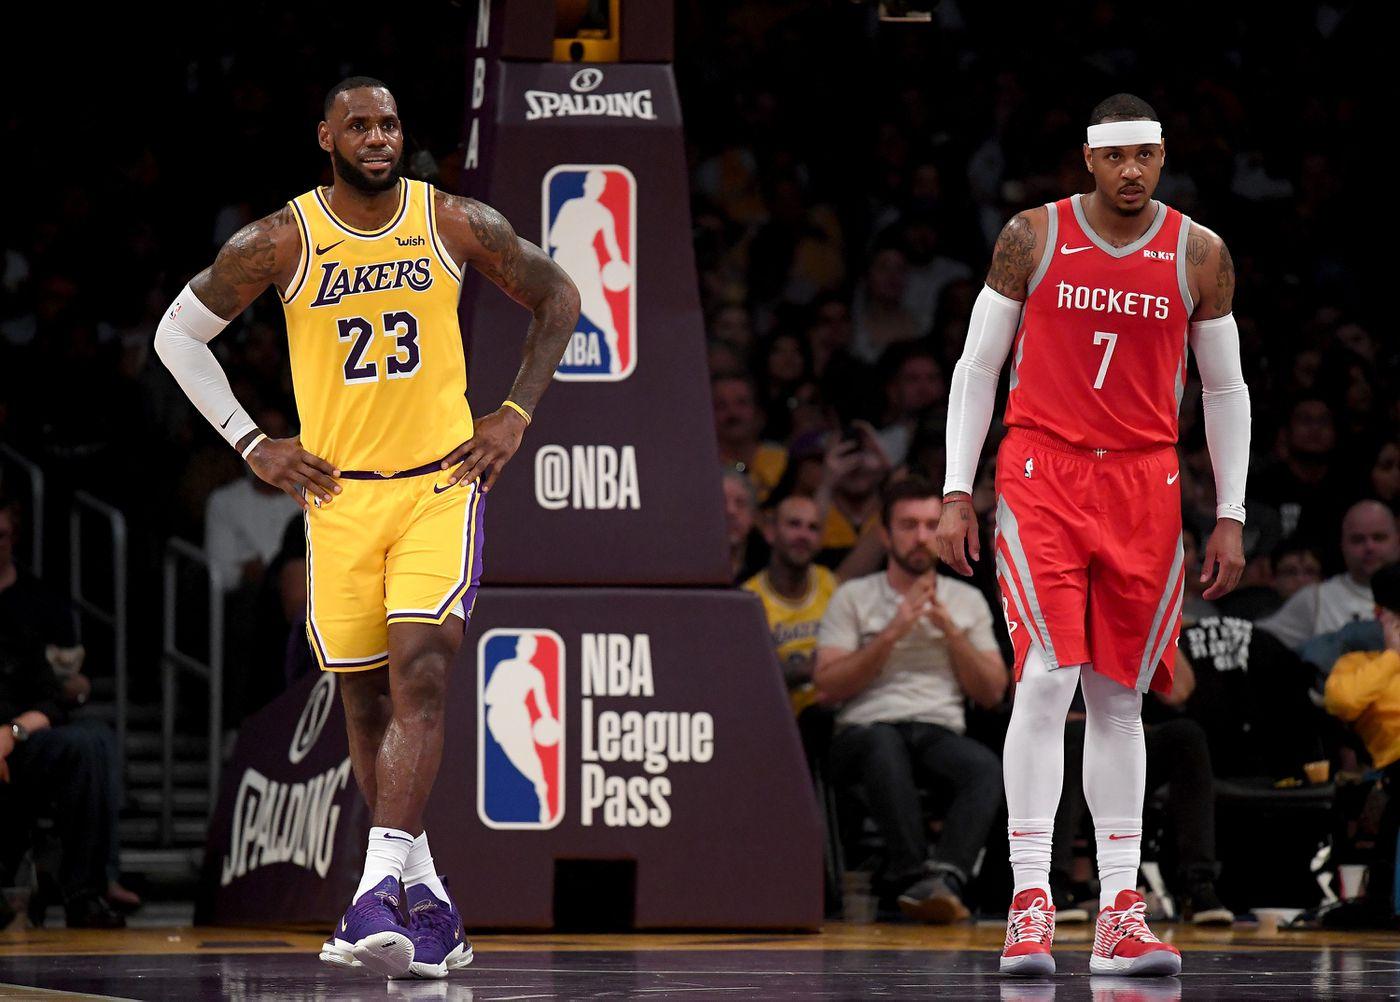 NBA Trade Deadline Tracker: The Latest on Marc Gasol, Anthony Davis